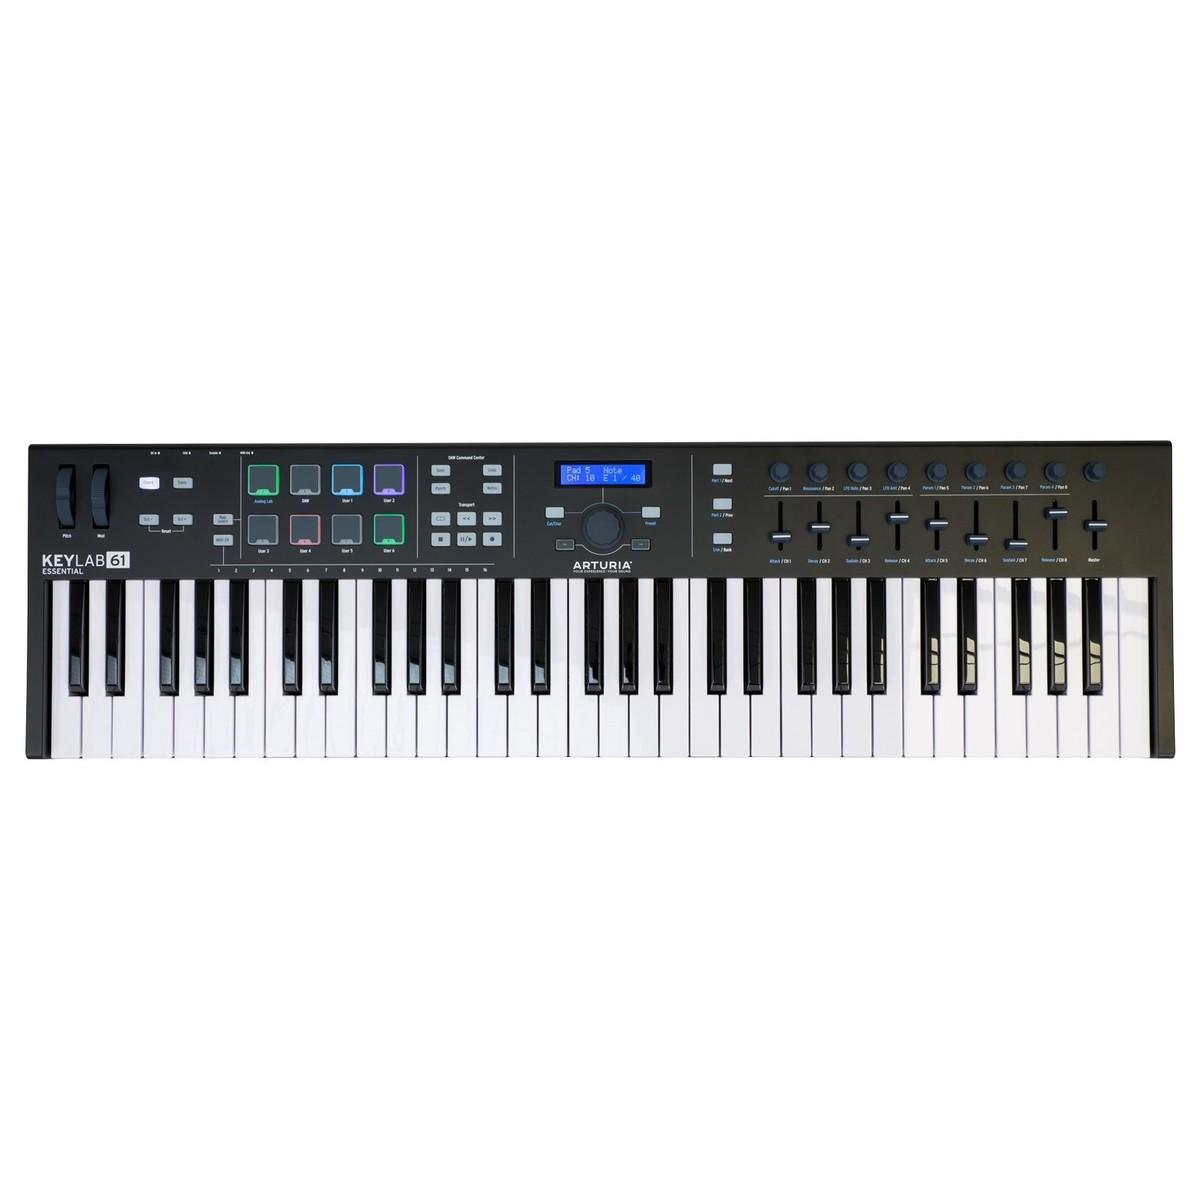 Drivers for Arturia KeyLab 61 Keyboard Controller